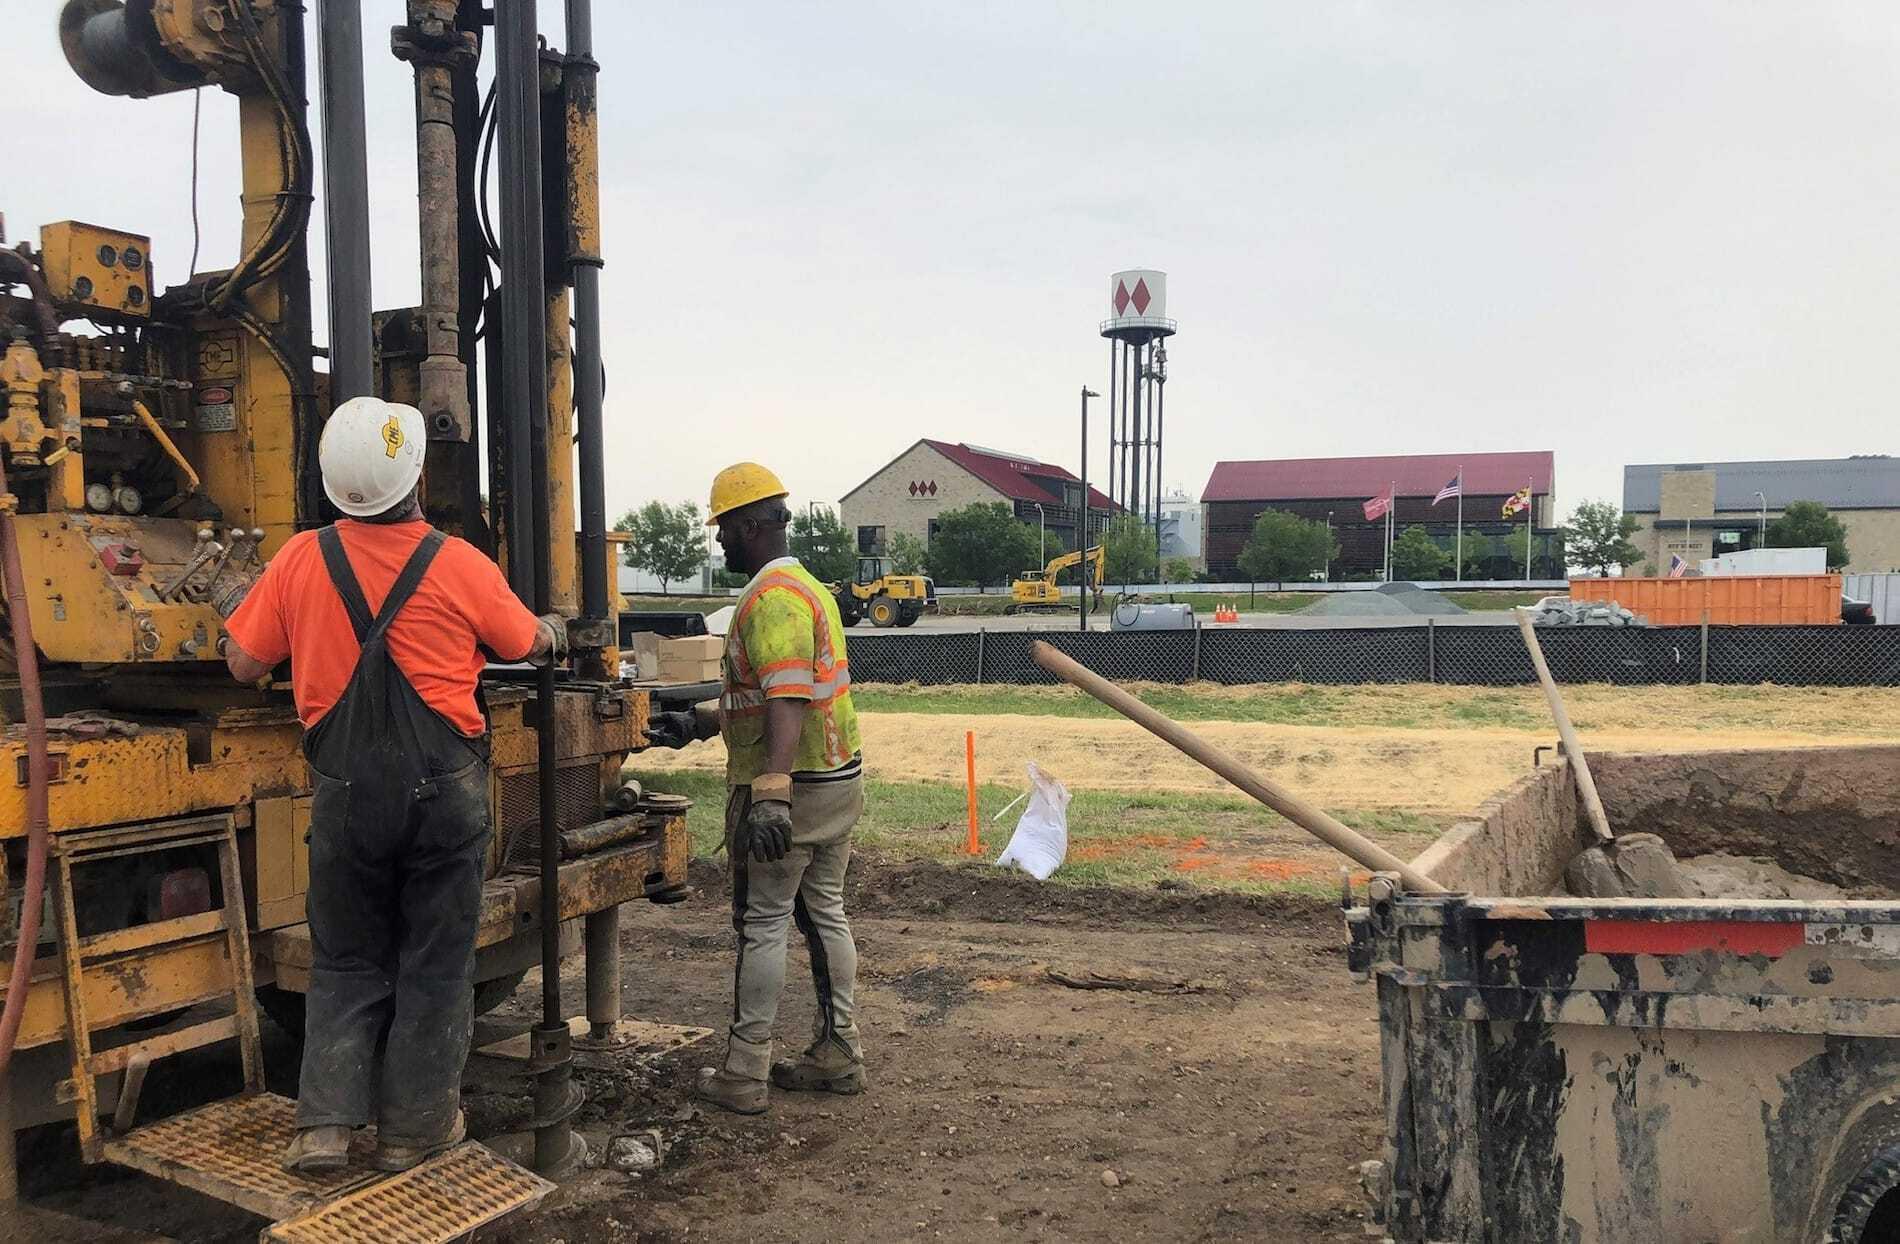 Port Covington Drilling